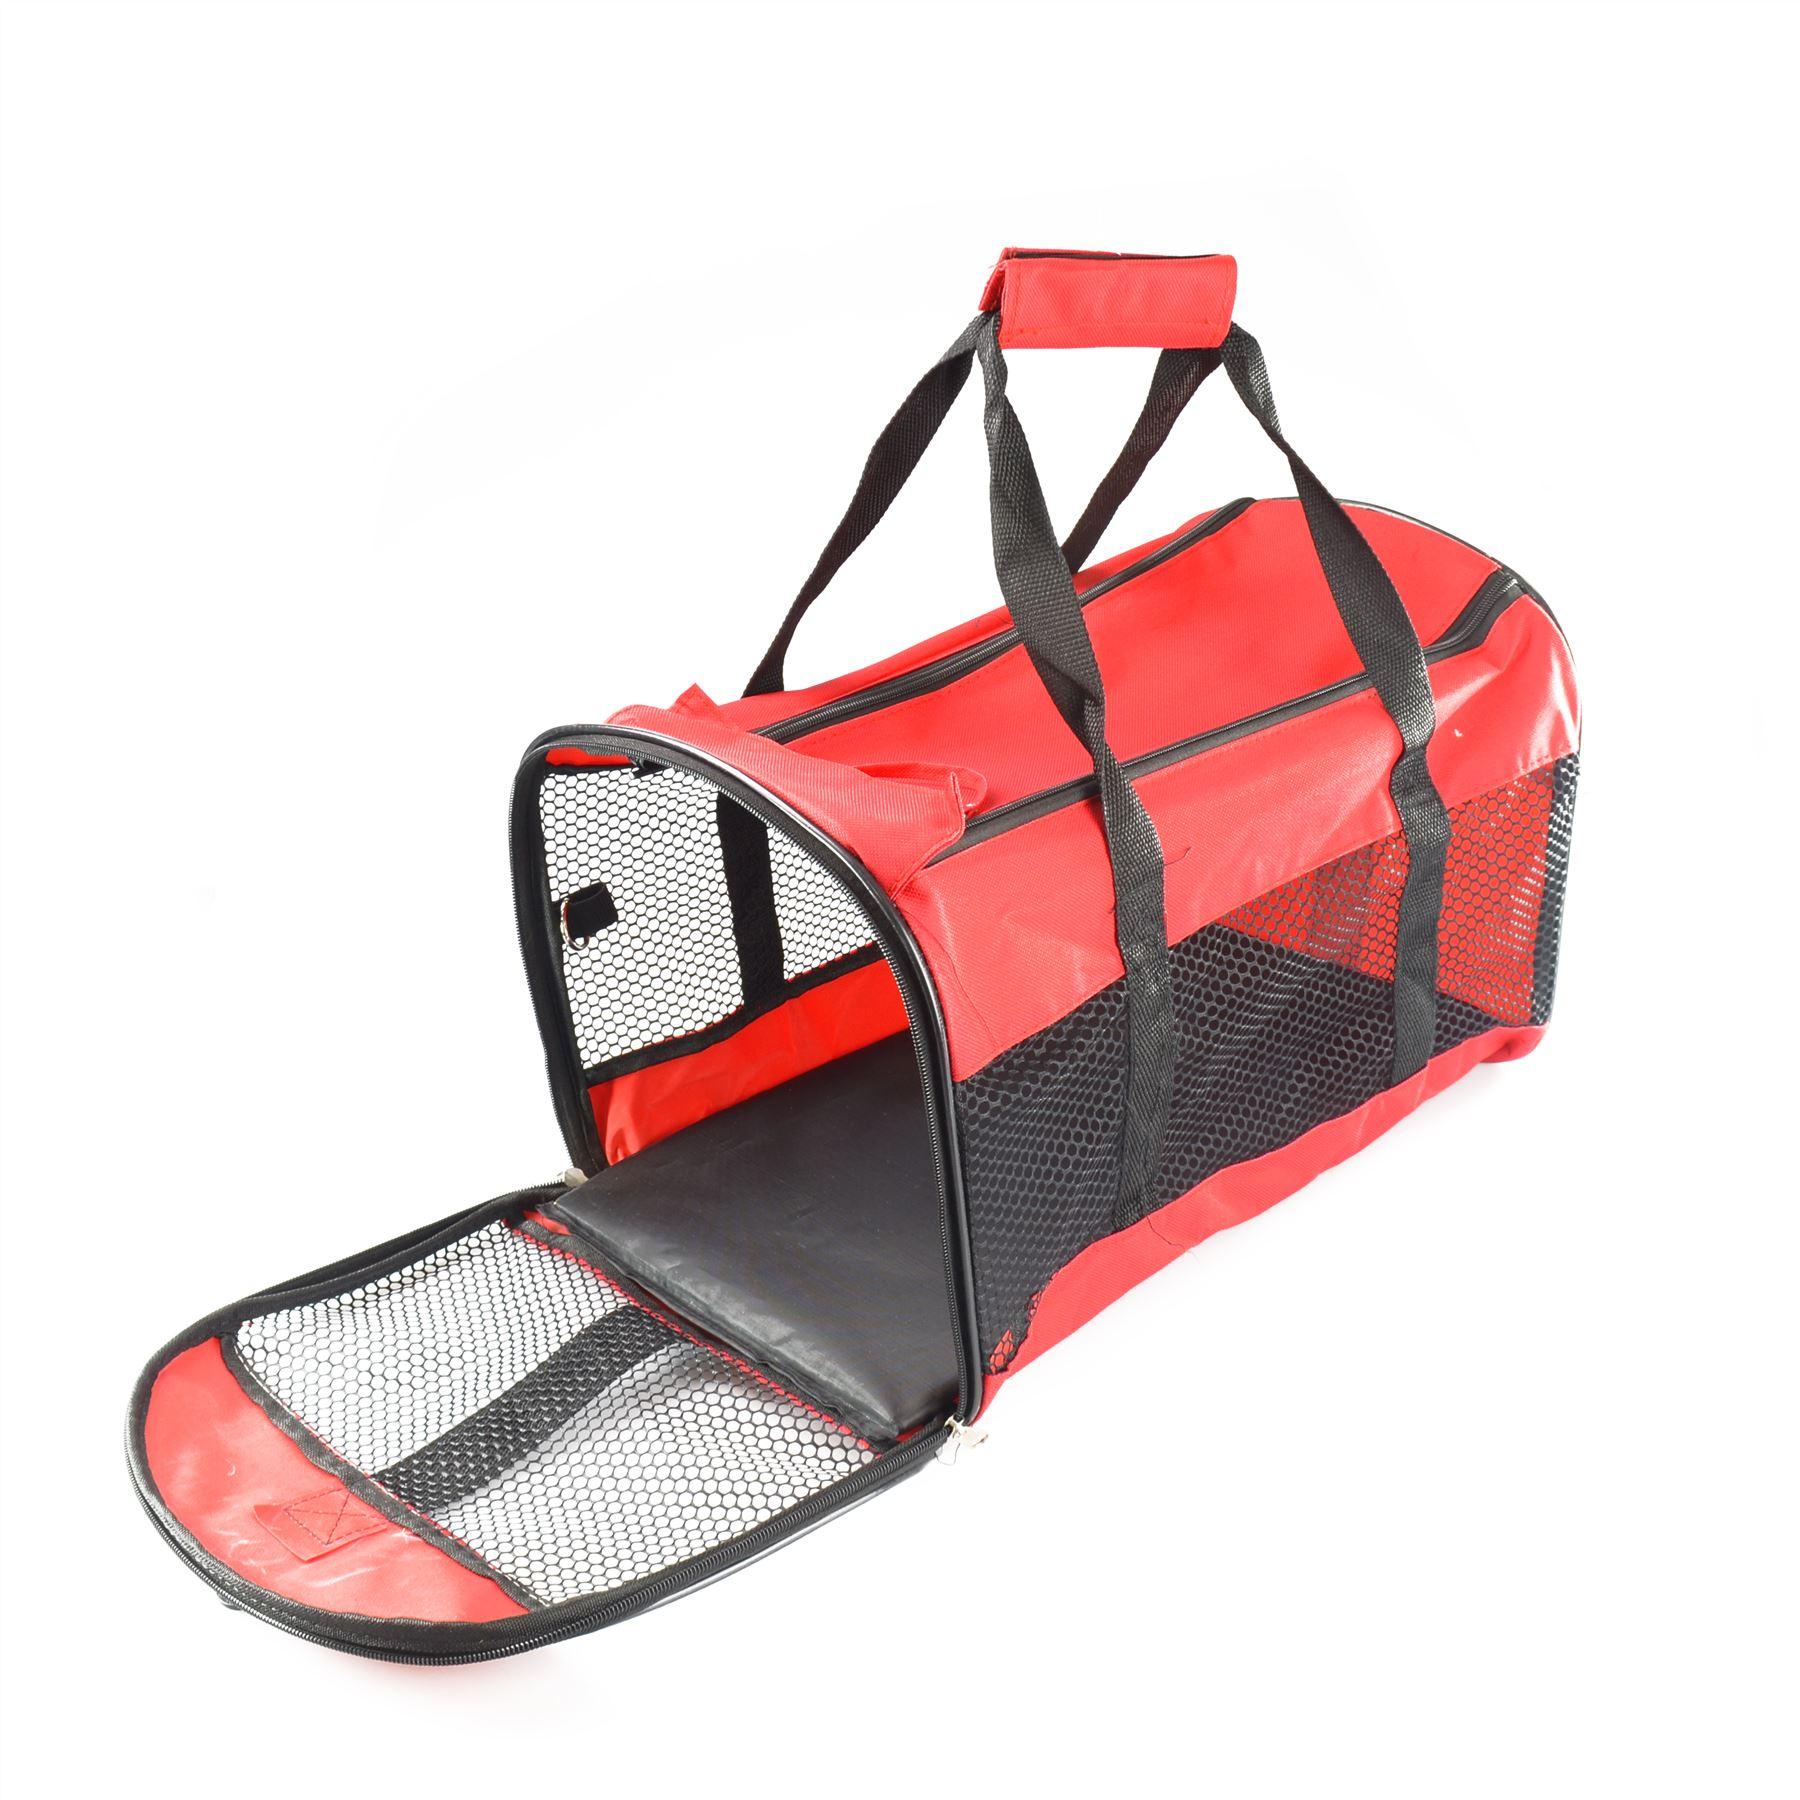 neu tragbar zusammenlegbar hund katze welpe transportbox. Black Bedroom Furniture Sets. Home Design Ideas